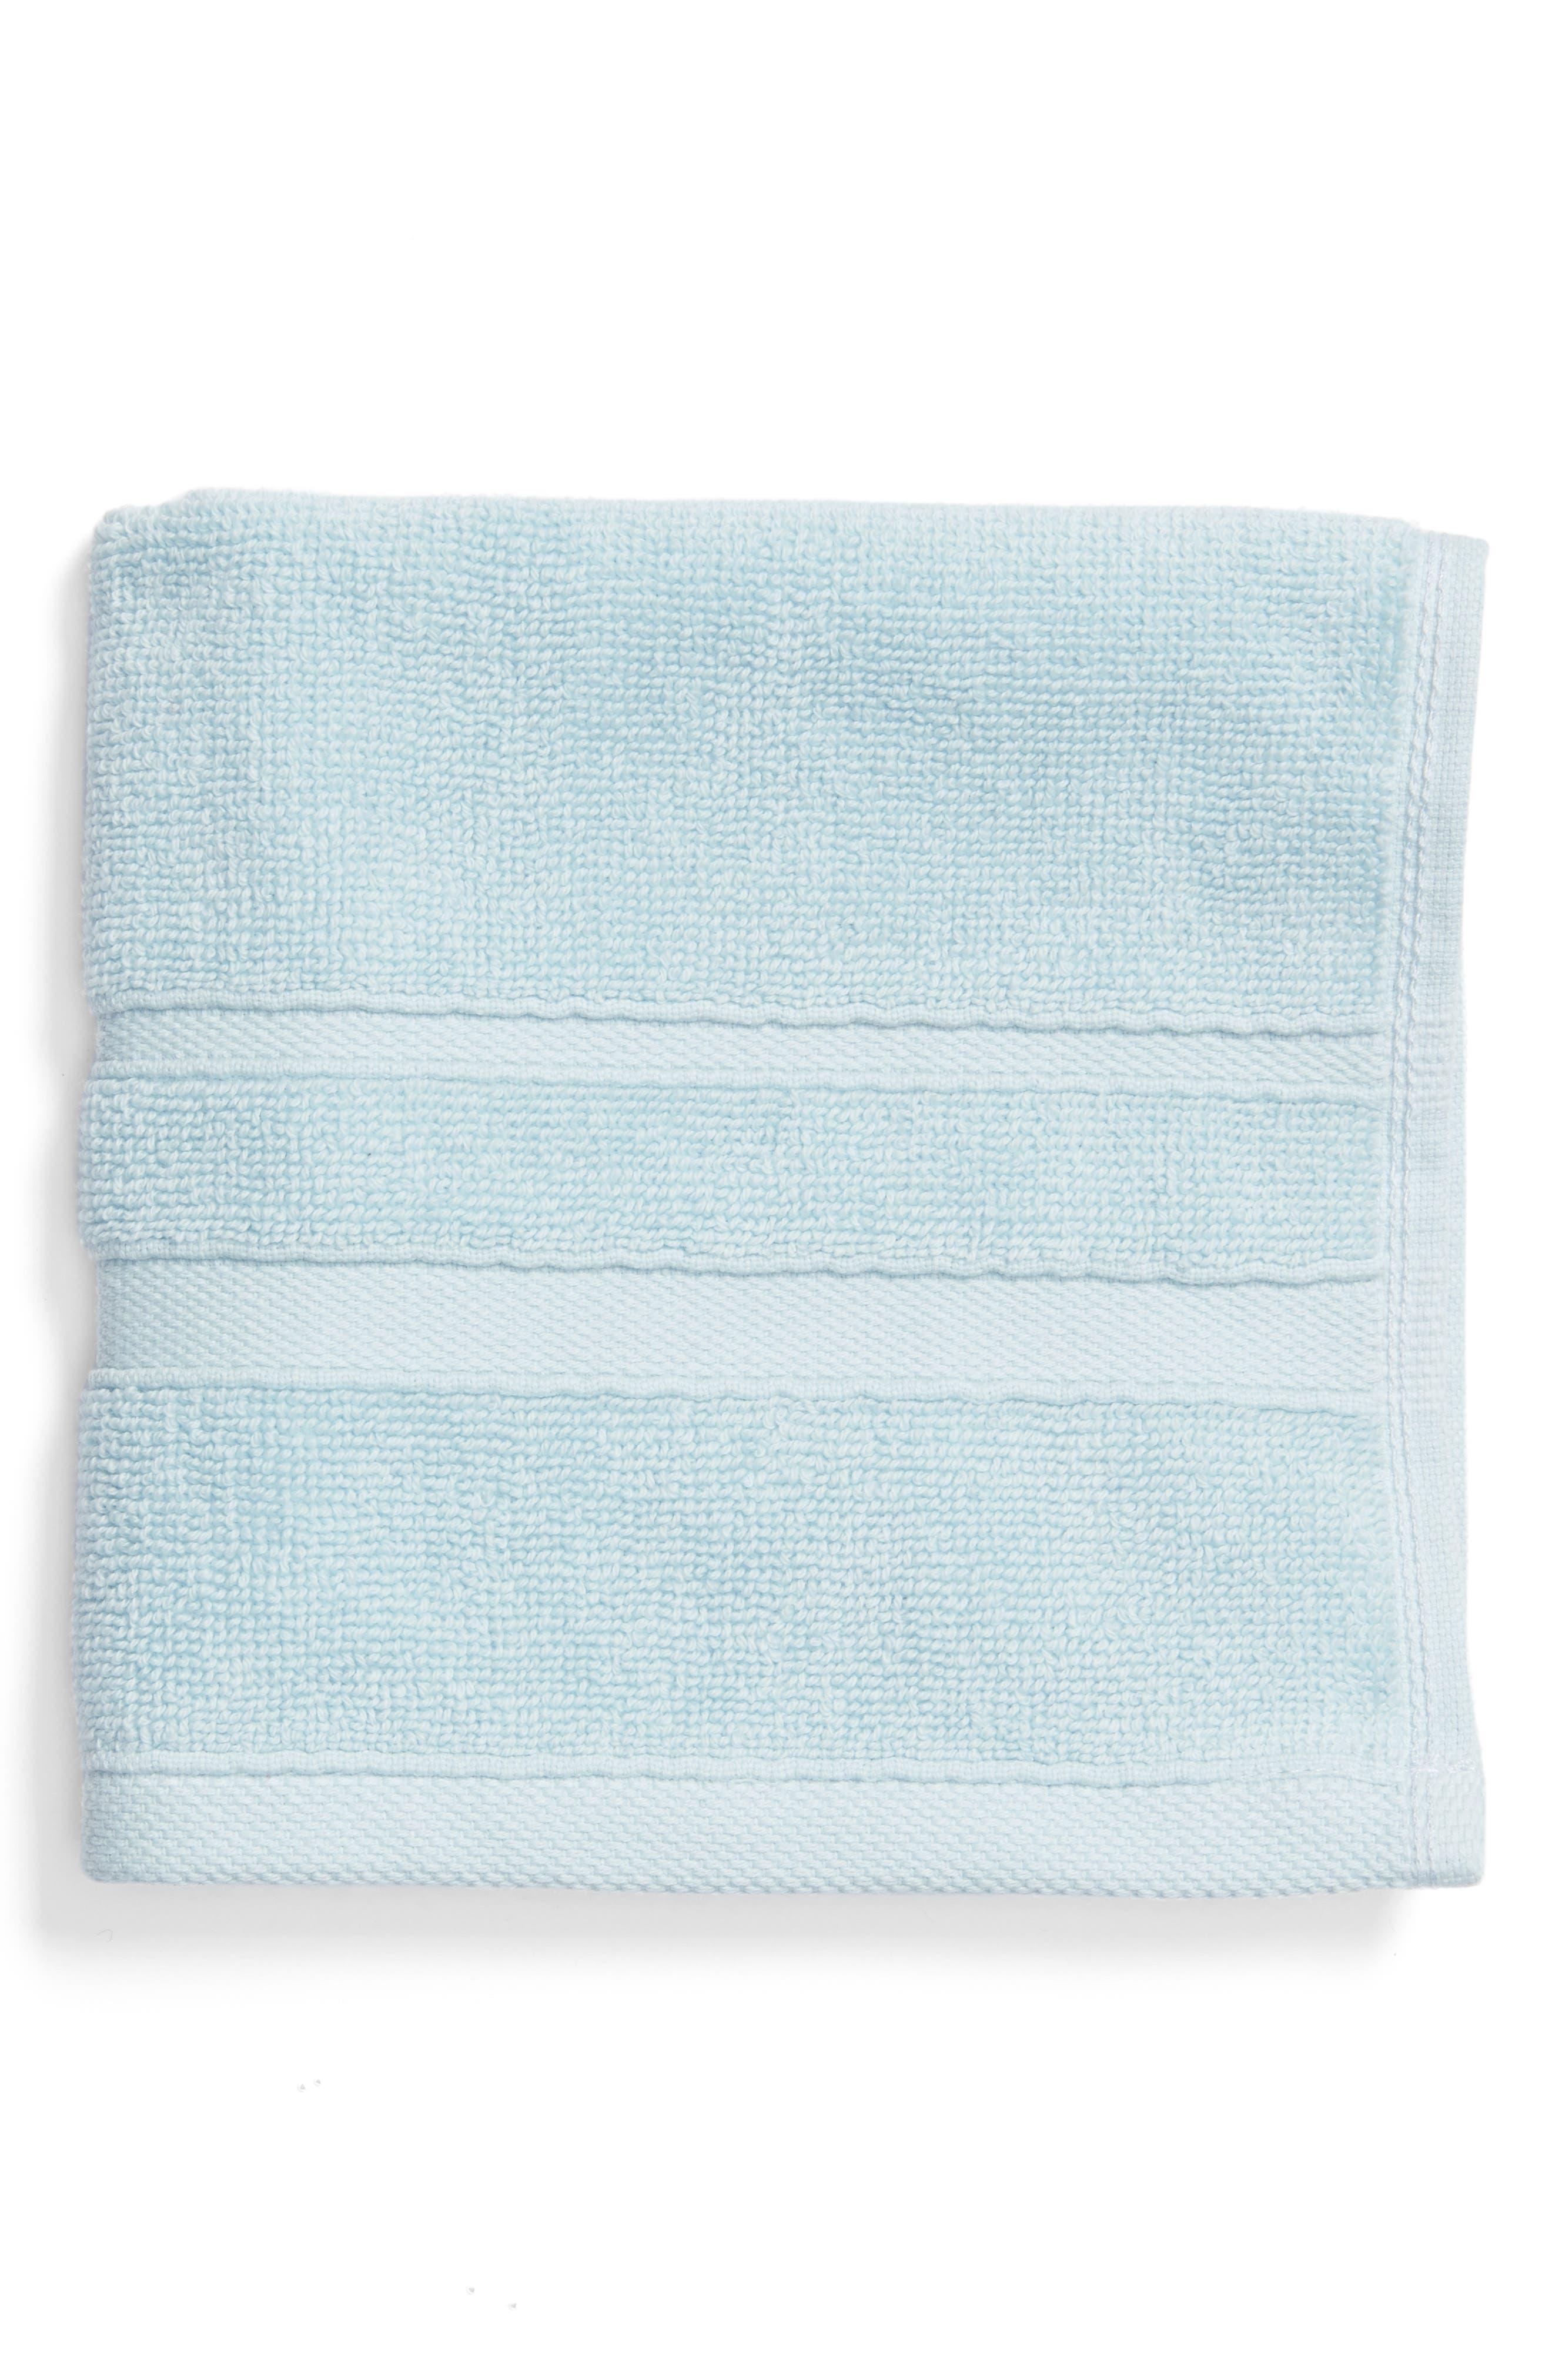 Studio 'Perennial' Combed Turkish Cotton Washcloth,                         Main,                         color, Chrystal Blue